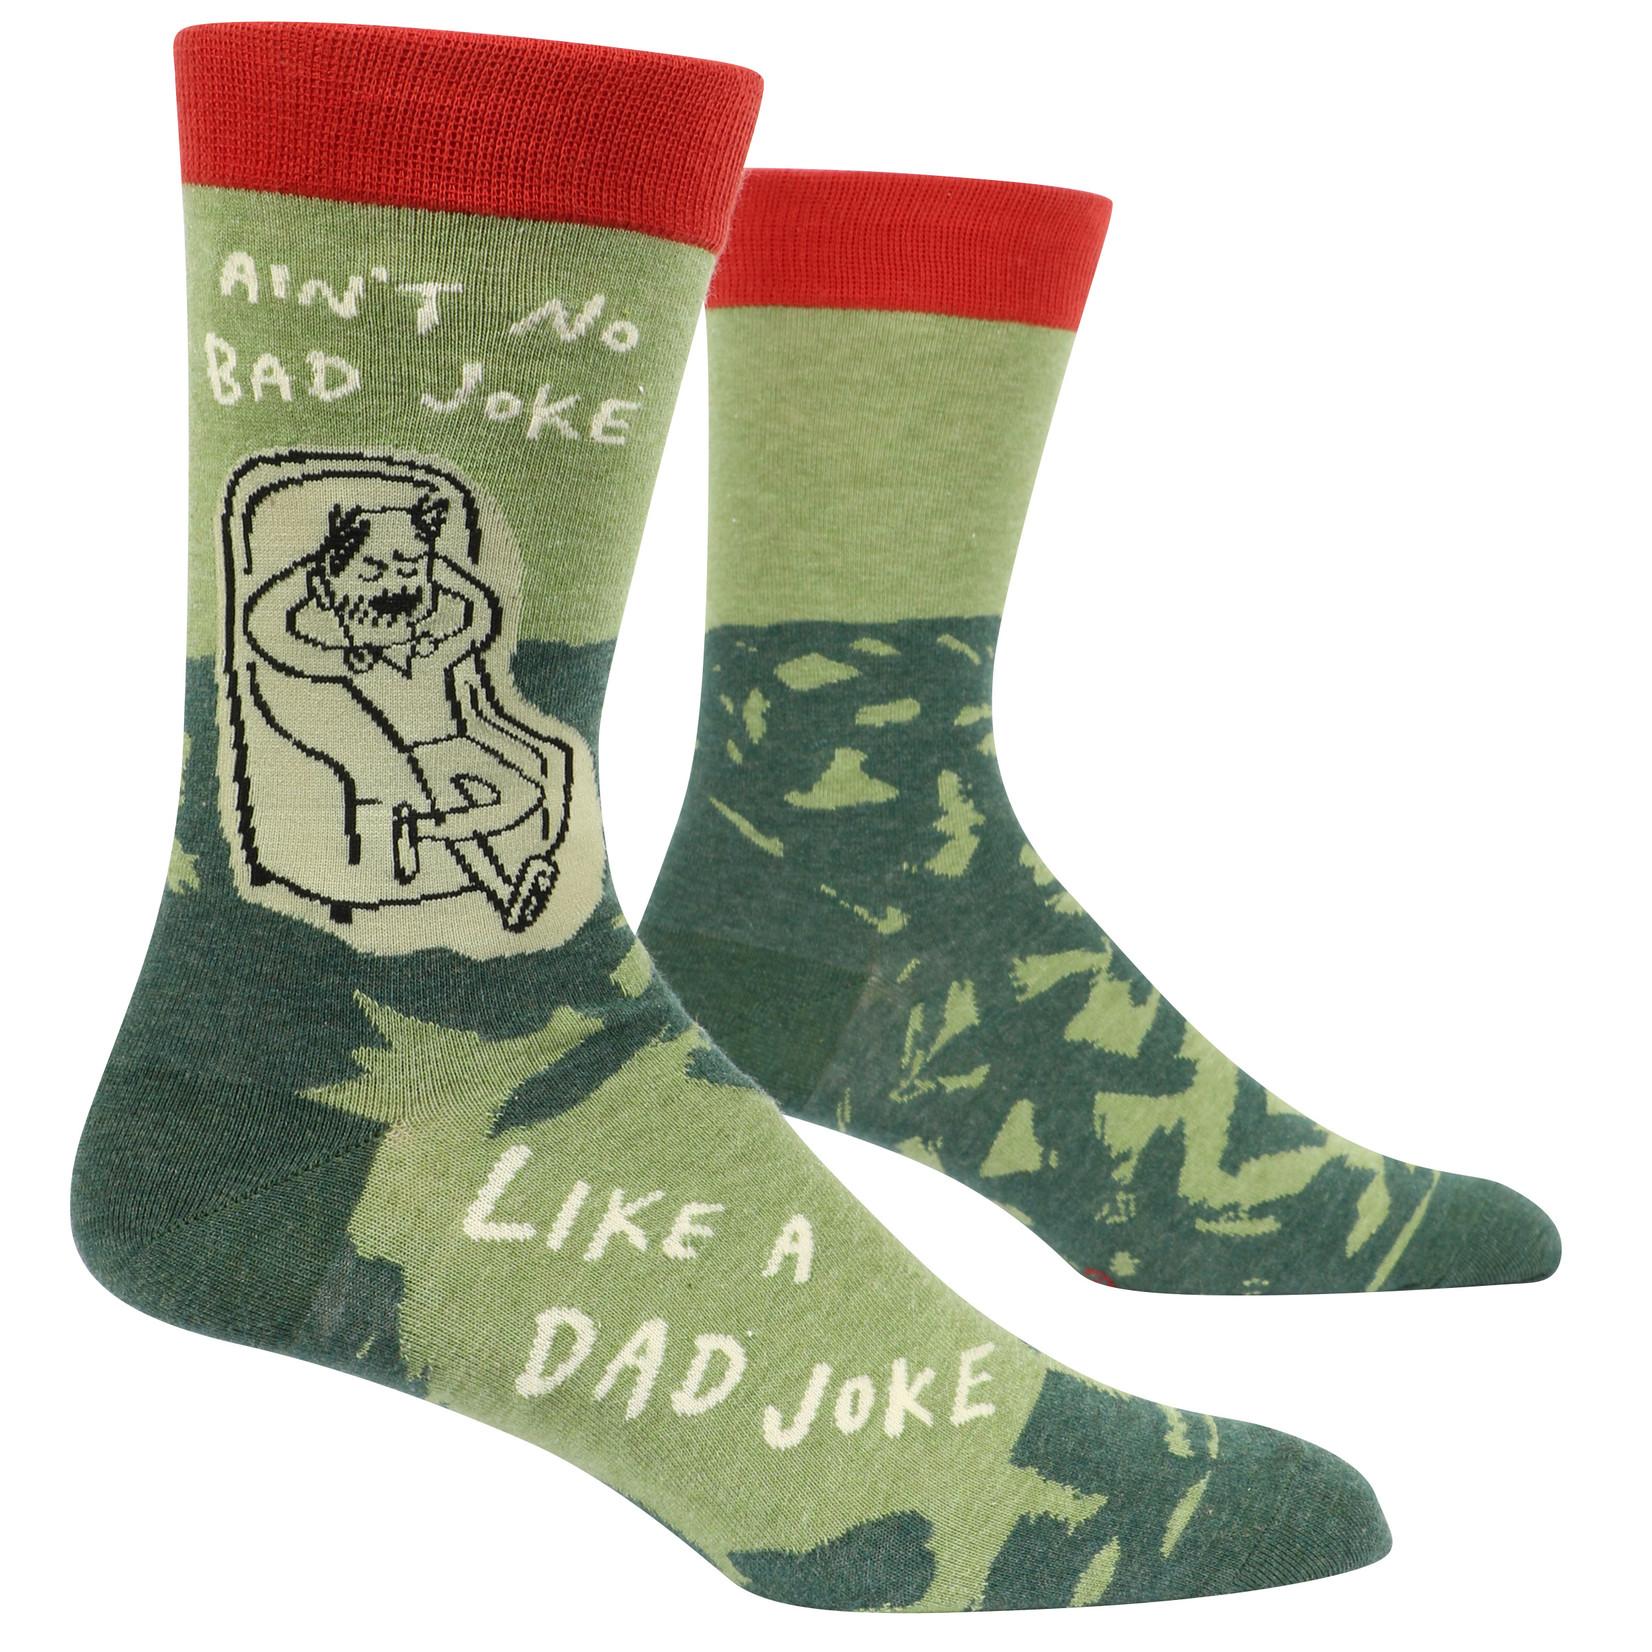 Blue Q Dad Joke M - Crew Socks